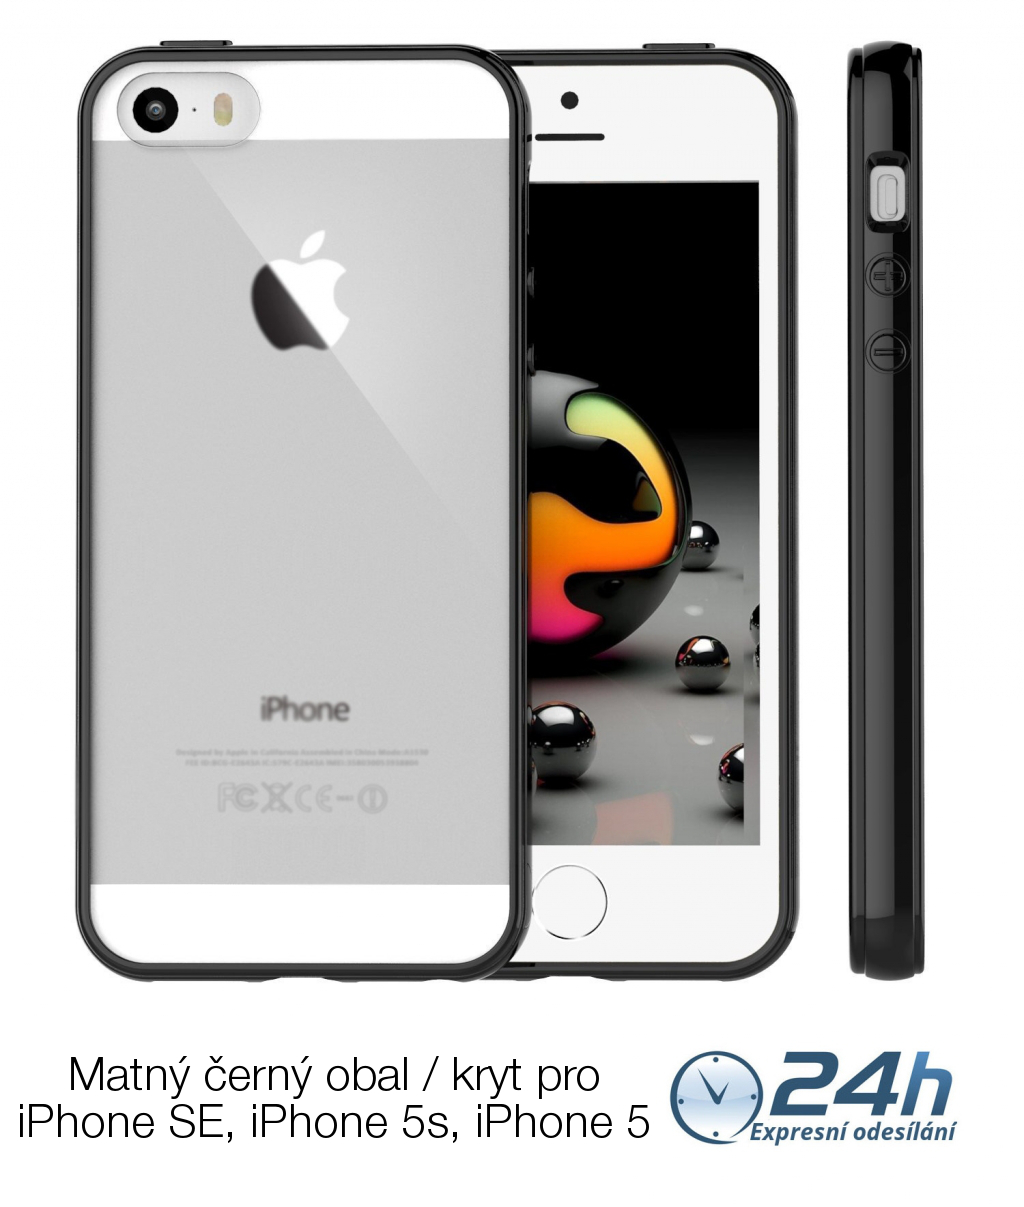 Černý matný obal / kryt na iPhone SE / 5s / 5